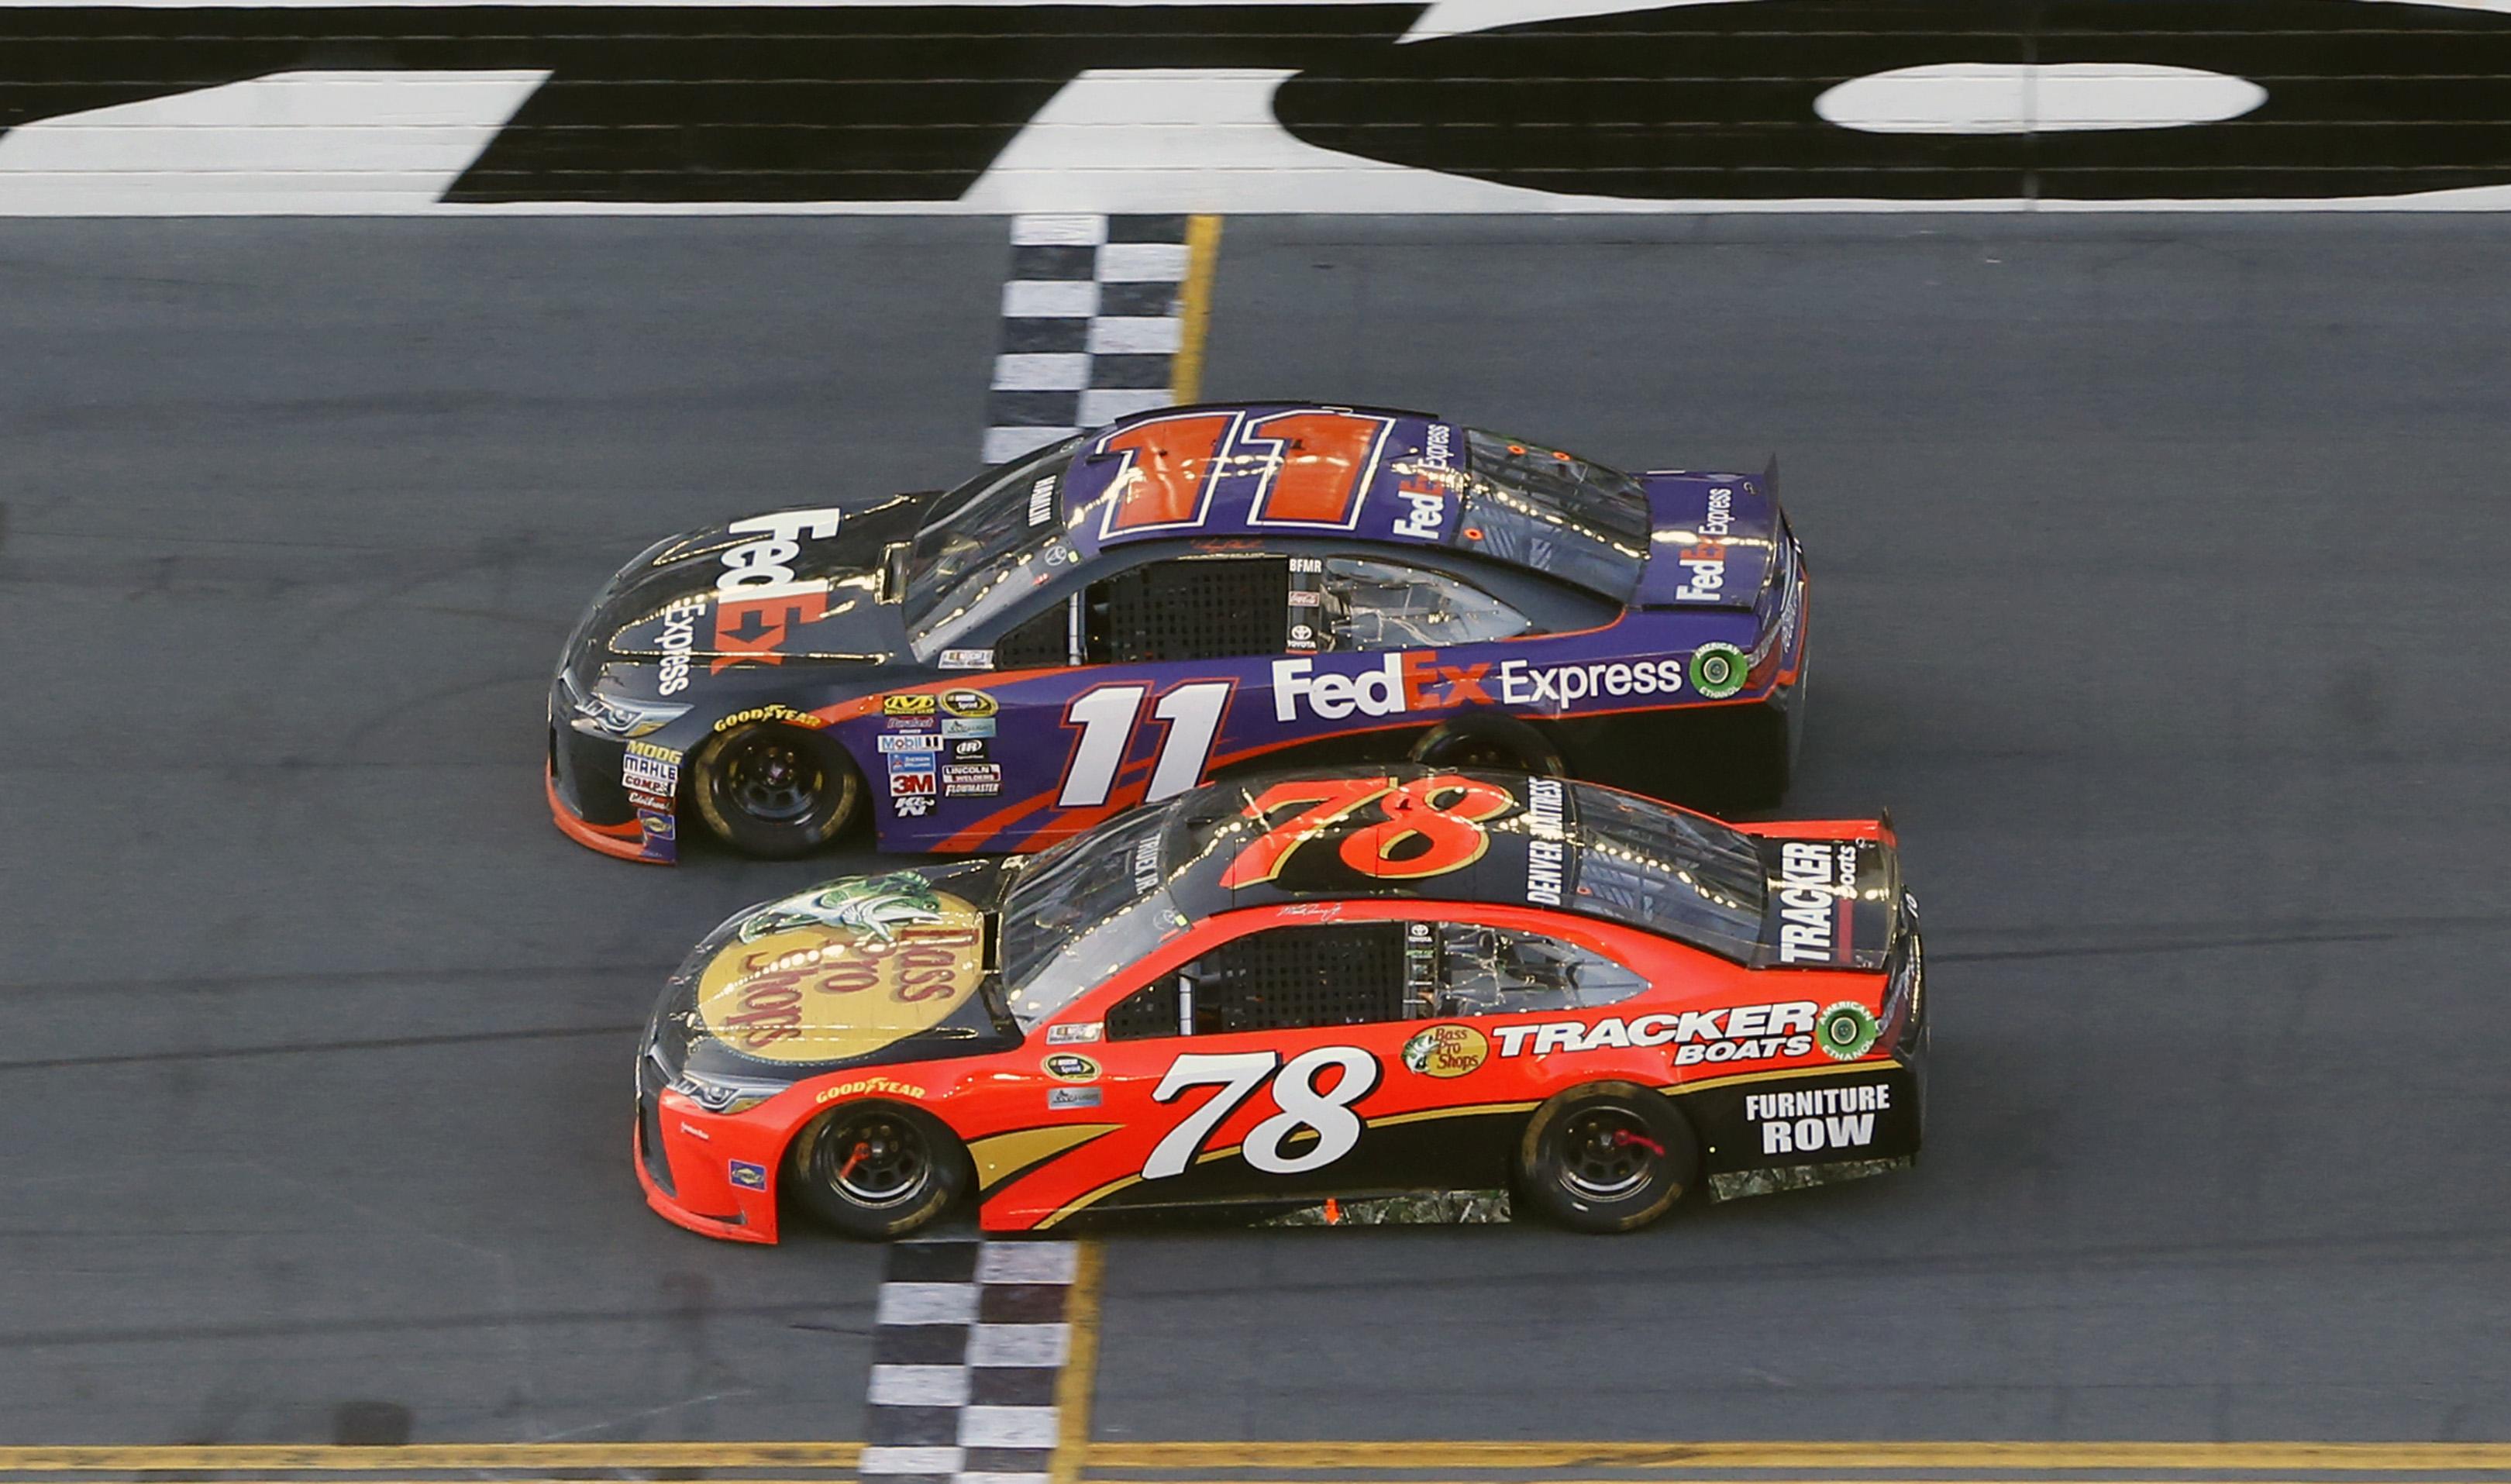 Denny Hamlin (11) beats out Martin Truex Jr. (78) at the finish line to win the NASCAR Daytona 500 auto race at Daytona International Speedway, Sunday, Feb. 21, 2016, in Daytona Beach, Fla. (AP Photo/Wilfredo Lee)